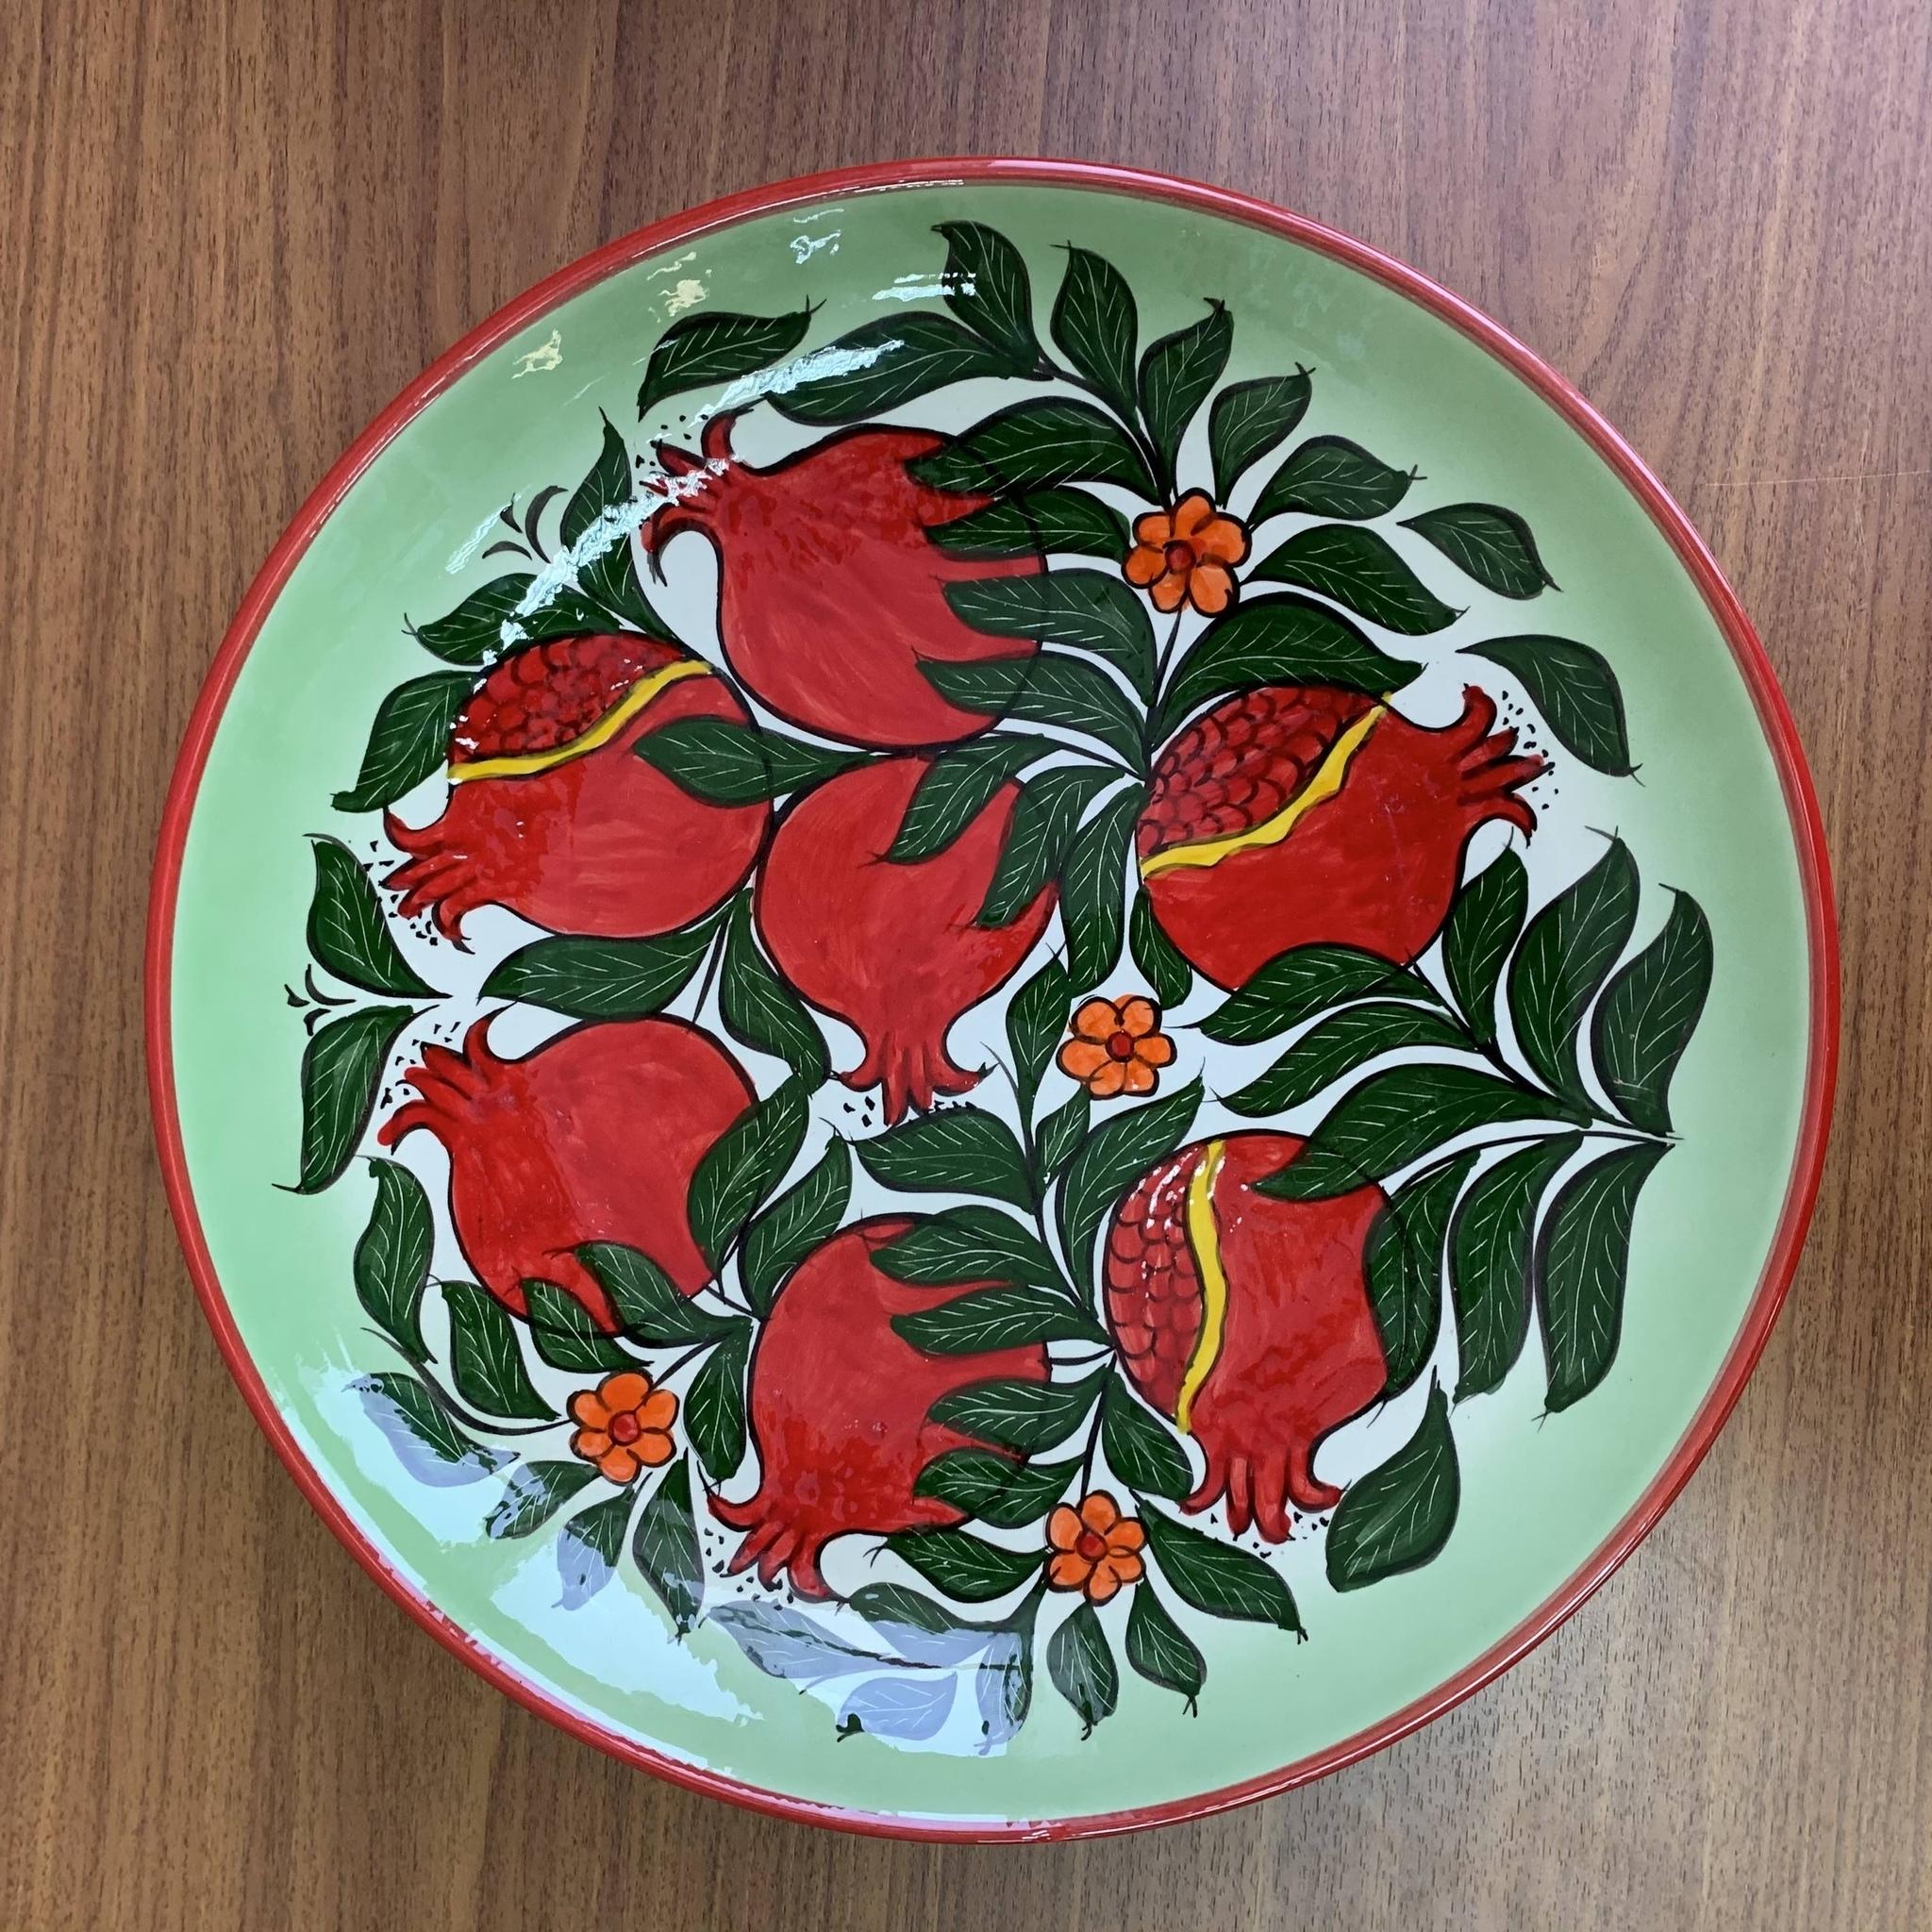 Посуда Ляган ручная роспись гранат 32 см 4Z8ws8Cz4dE.jpg